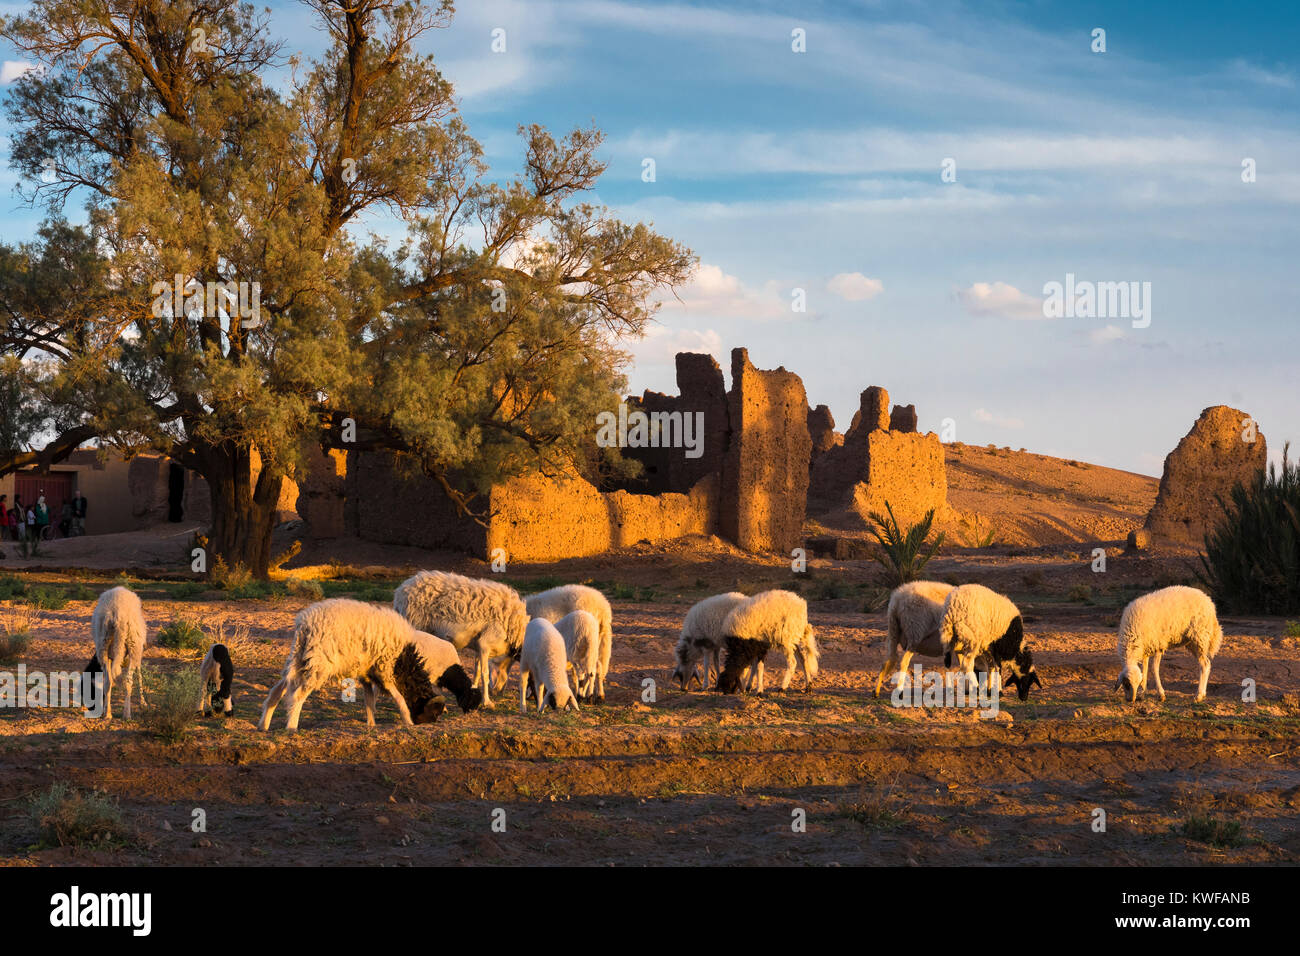 Sheep grazing in idyllic environs of Kasbah at sundown. - Stock Image